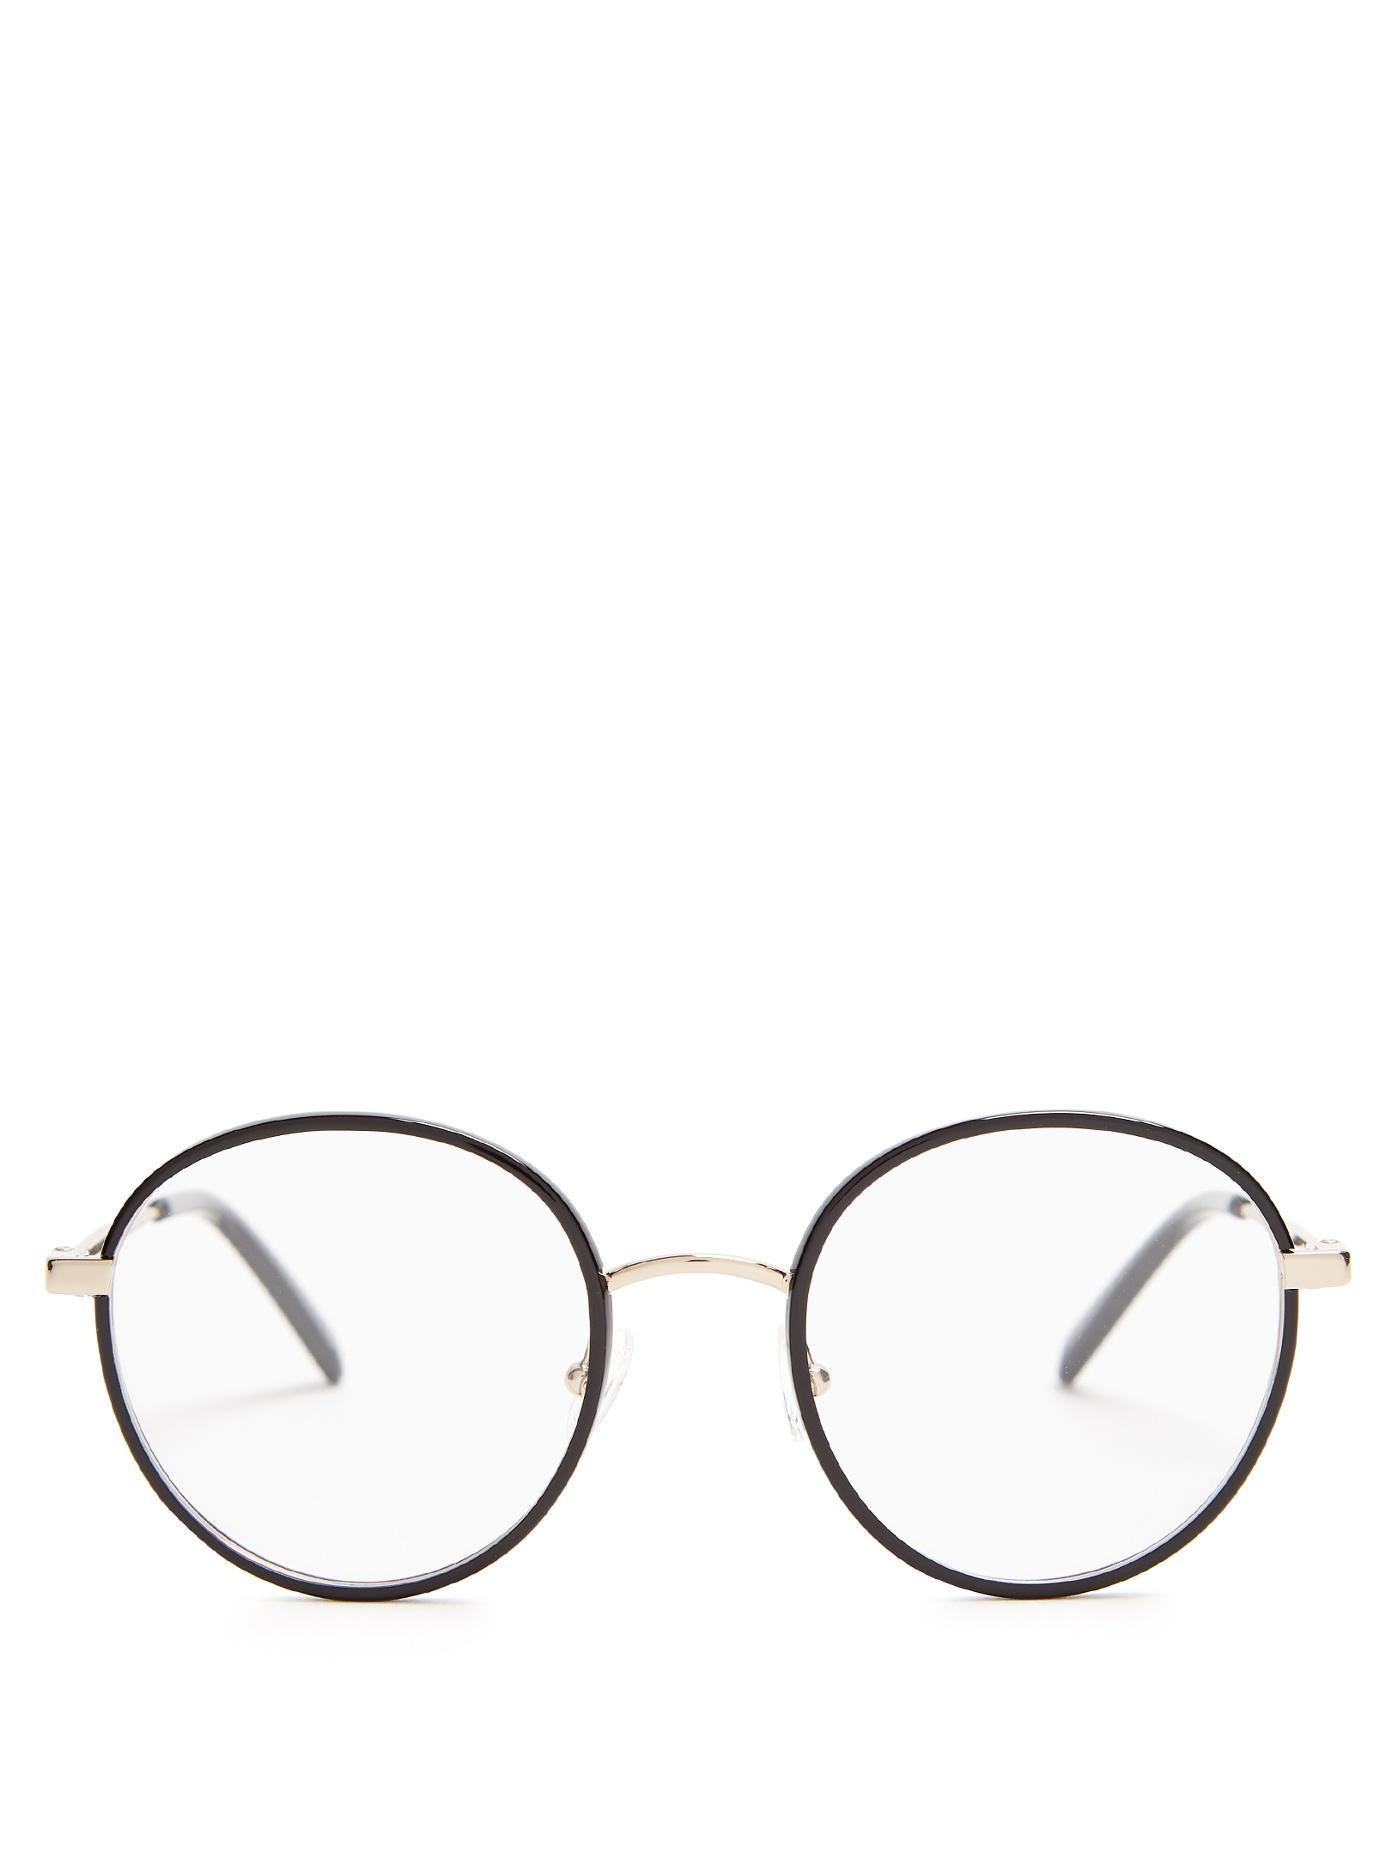 324ce91799 Stella Mccartney Round-Frame Metal Glasses In Black